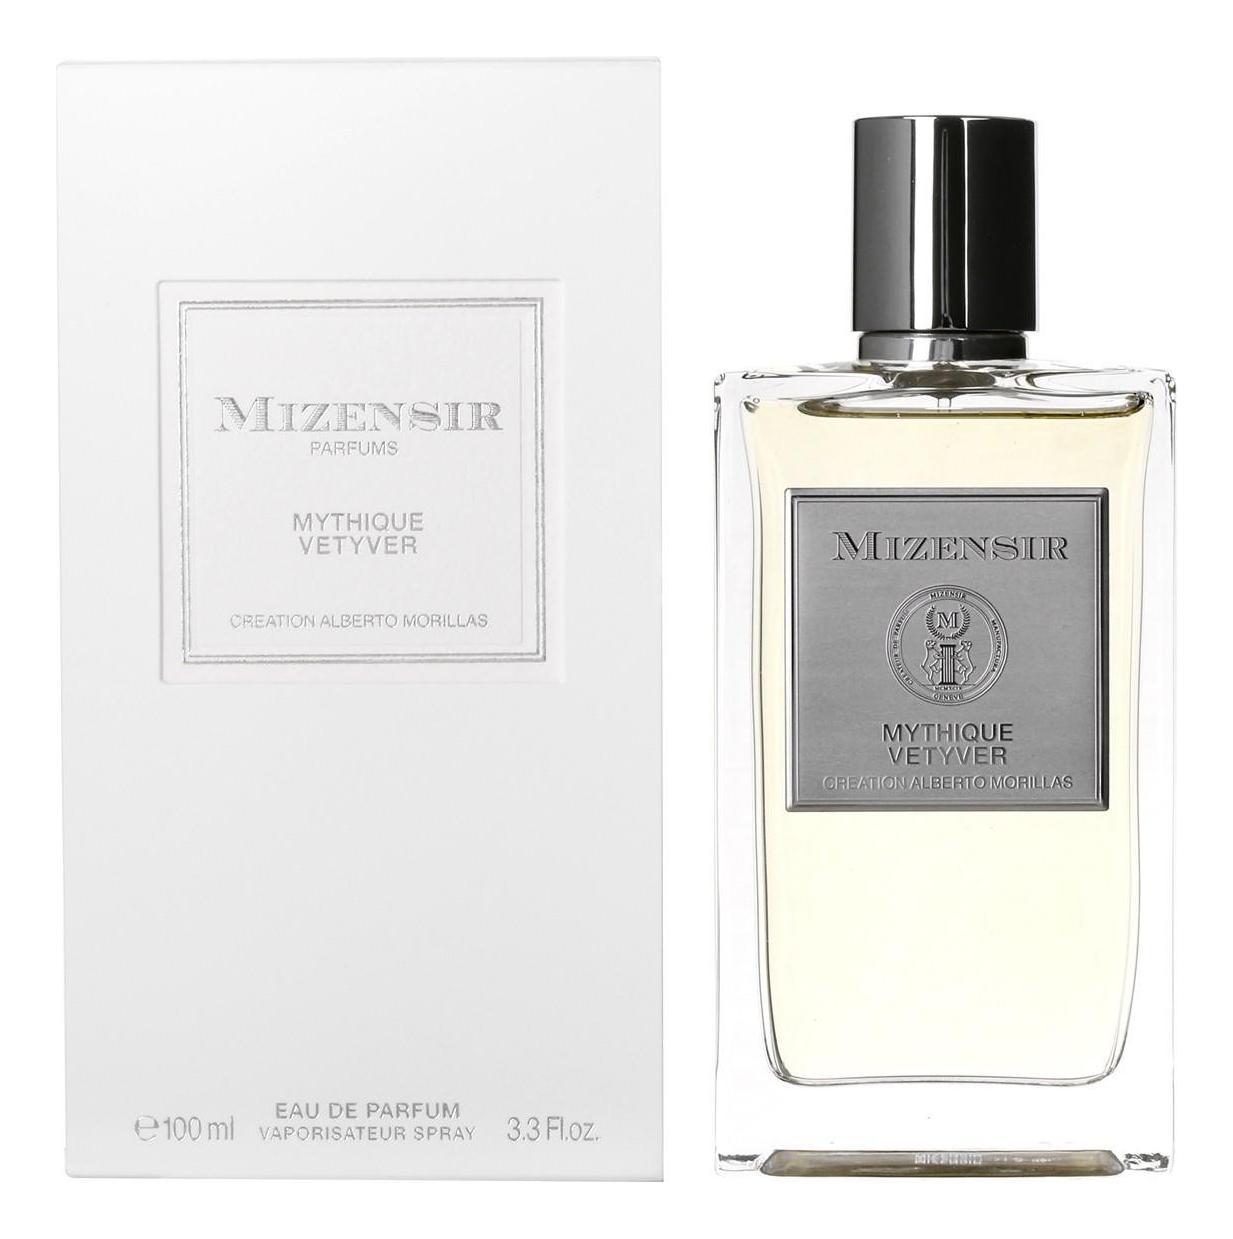 Купить Mythique Vetiver: парфюмерная вода 100мл, Mizensir